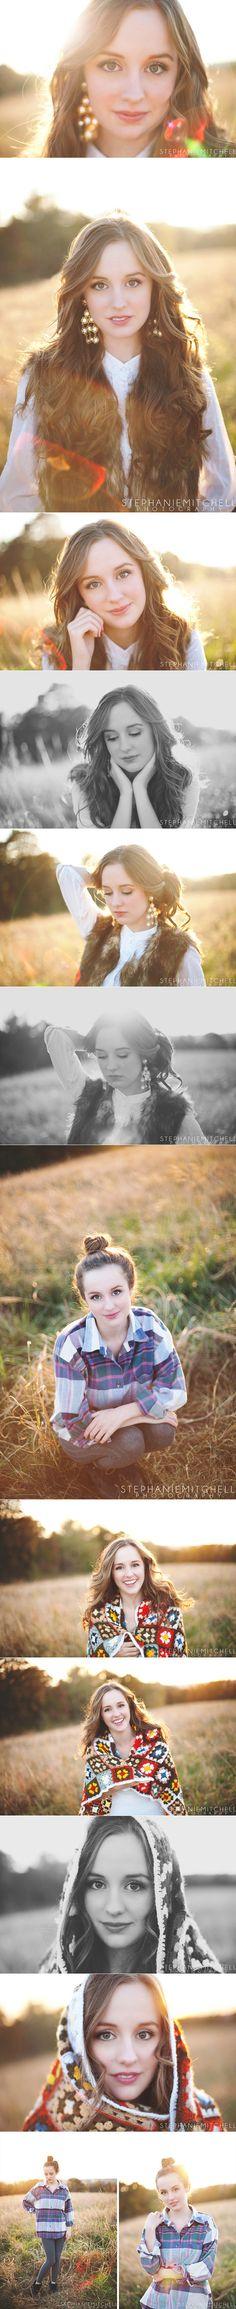 Lippi Lippi Williams senior photography inspiration